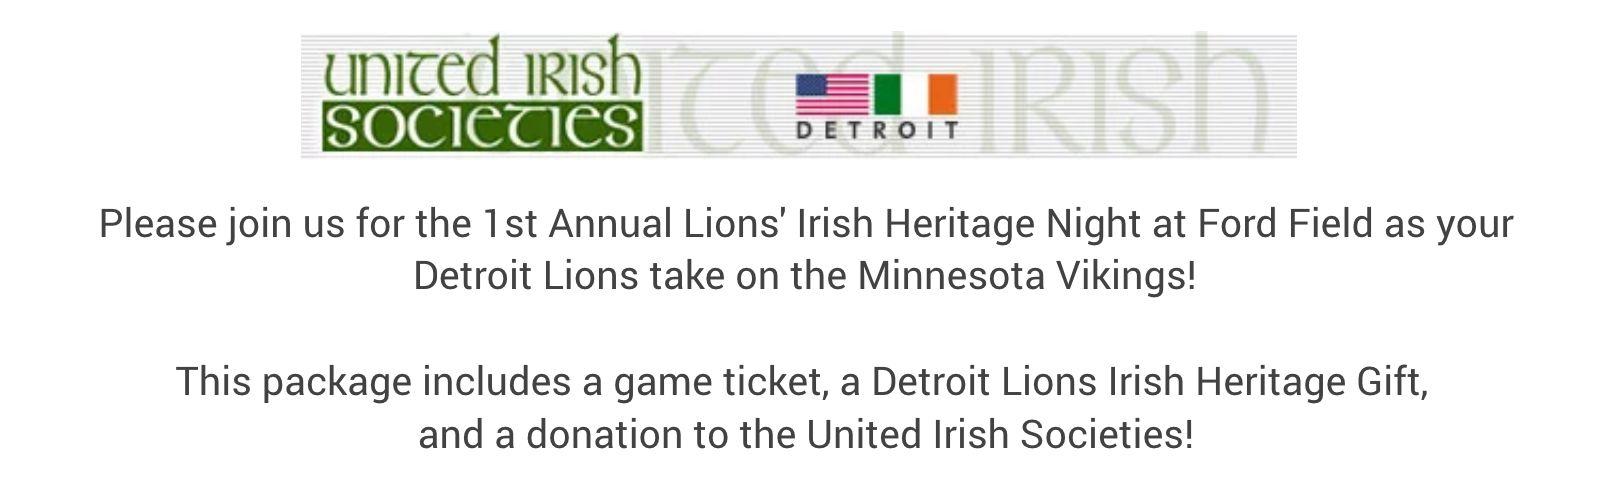 irish-heritage-header